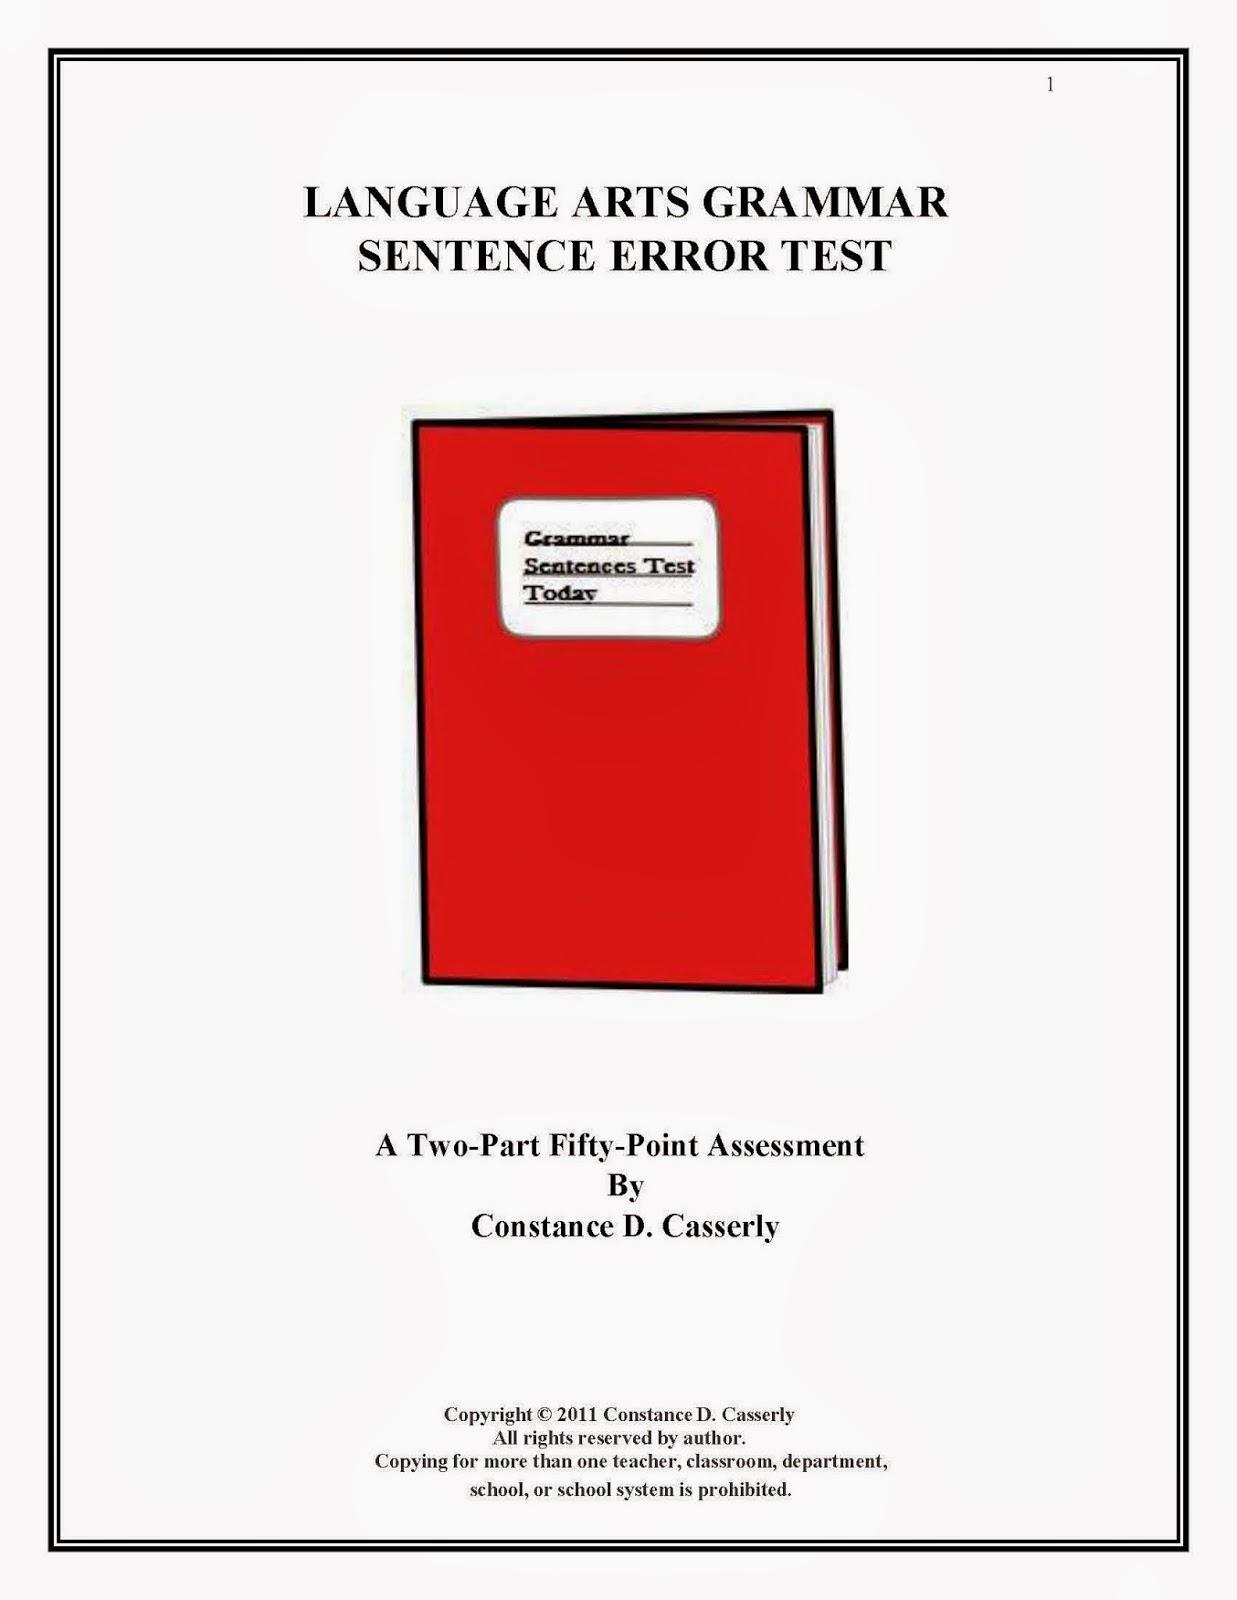 Middle School and High School Grammar -Sentence Error Test